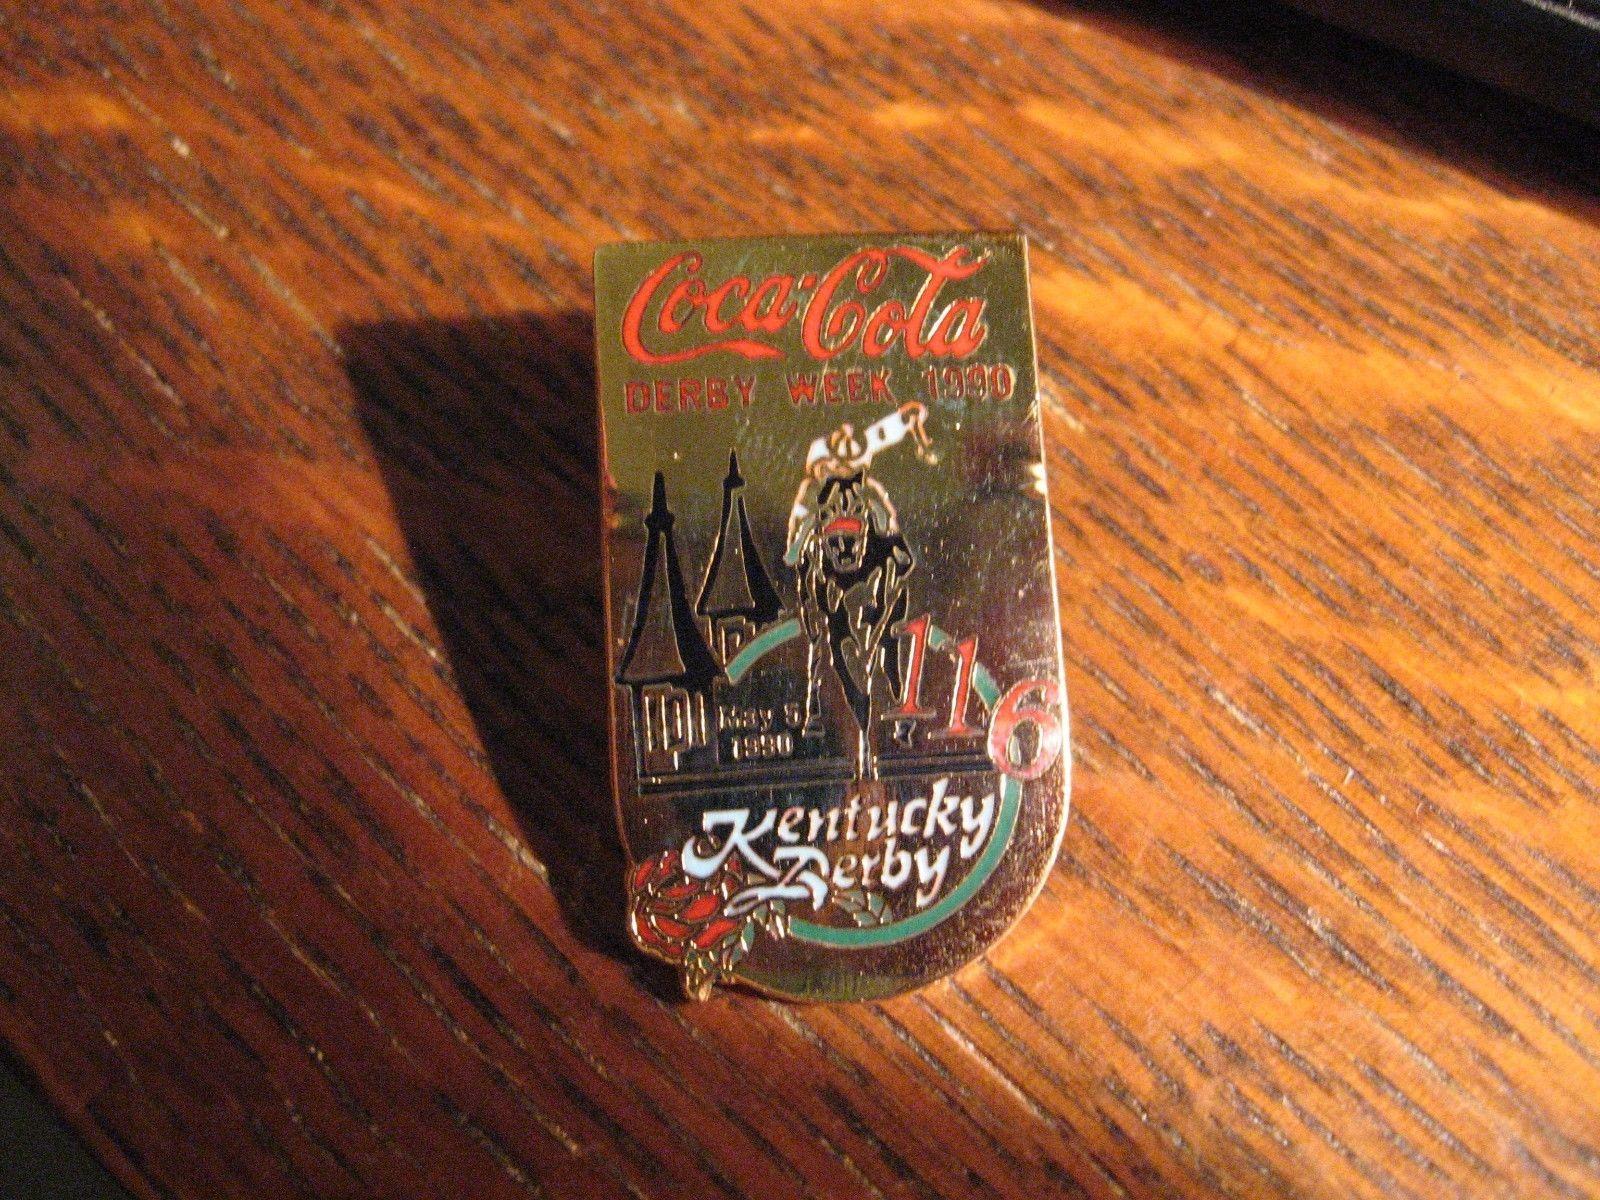 Kentucky Derby Coca Cola Pin - Vintage 1990 Coke Louisville Soda Pop Lapel Pin